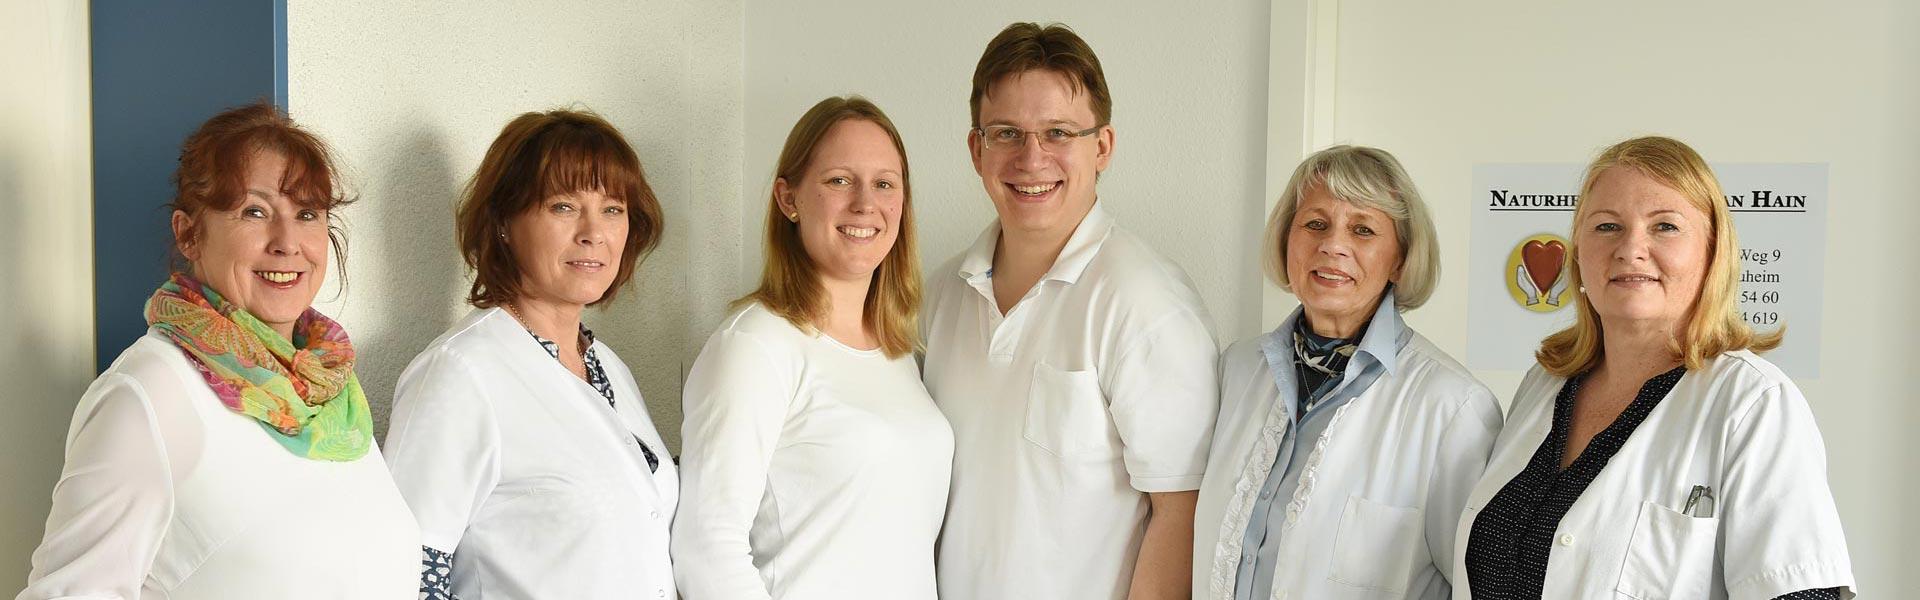 Heilpraxis Fabian Hain Team